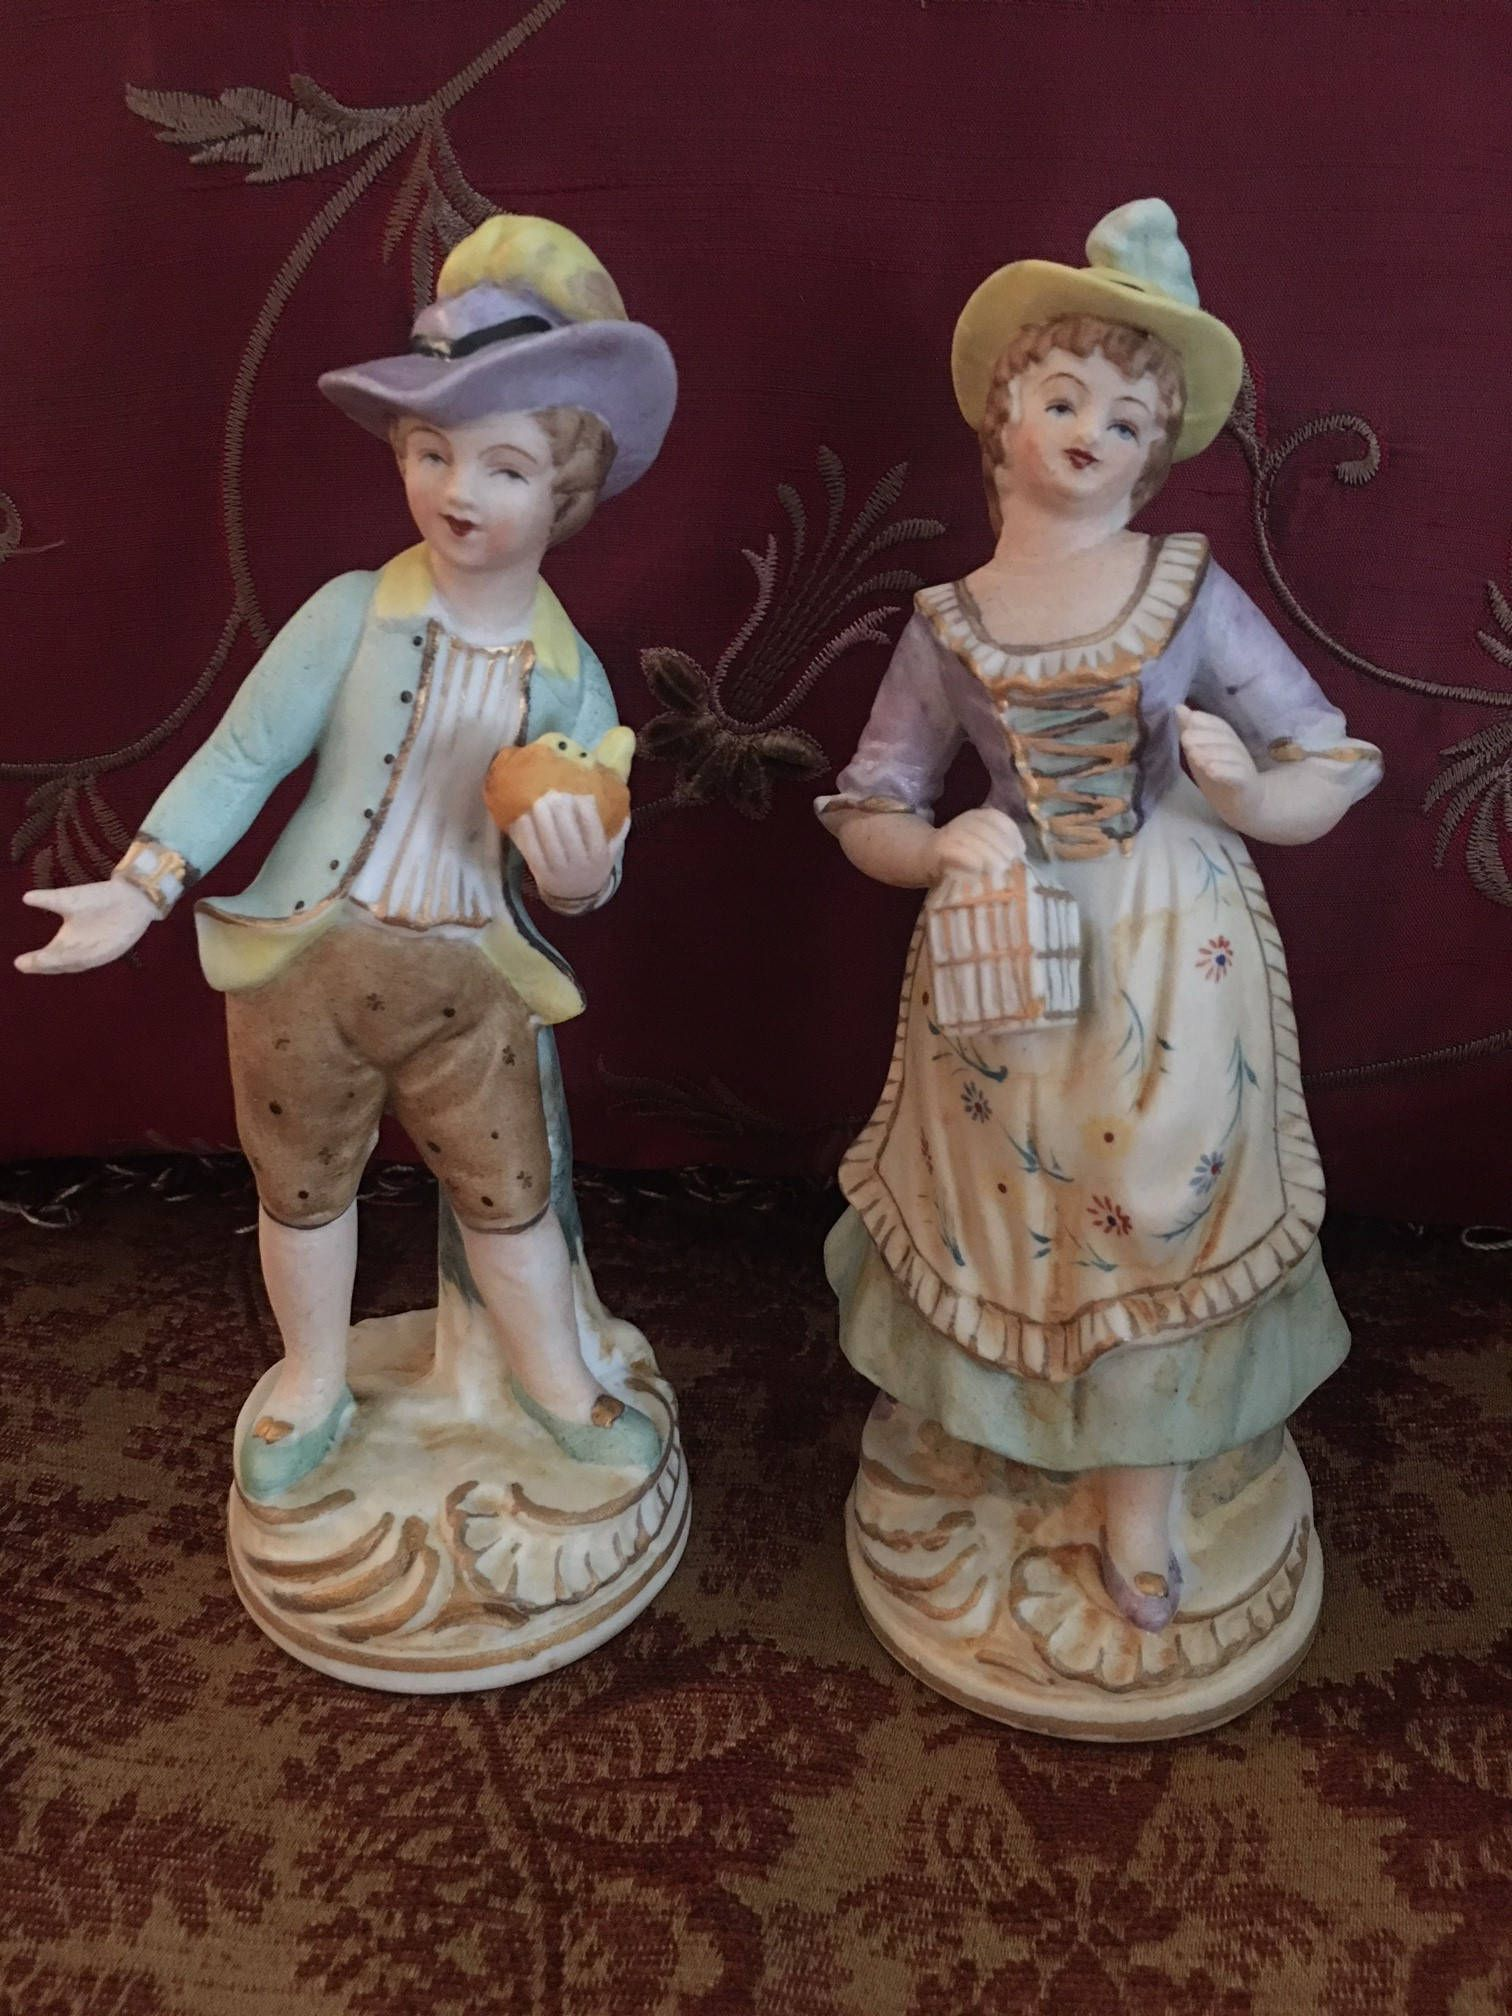 Marked Pair of Antique Vintage Victorian Bisque Porcelain Figures